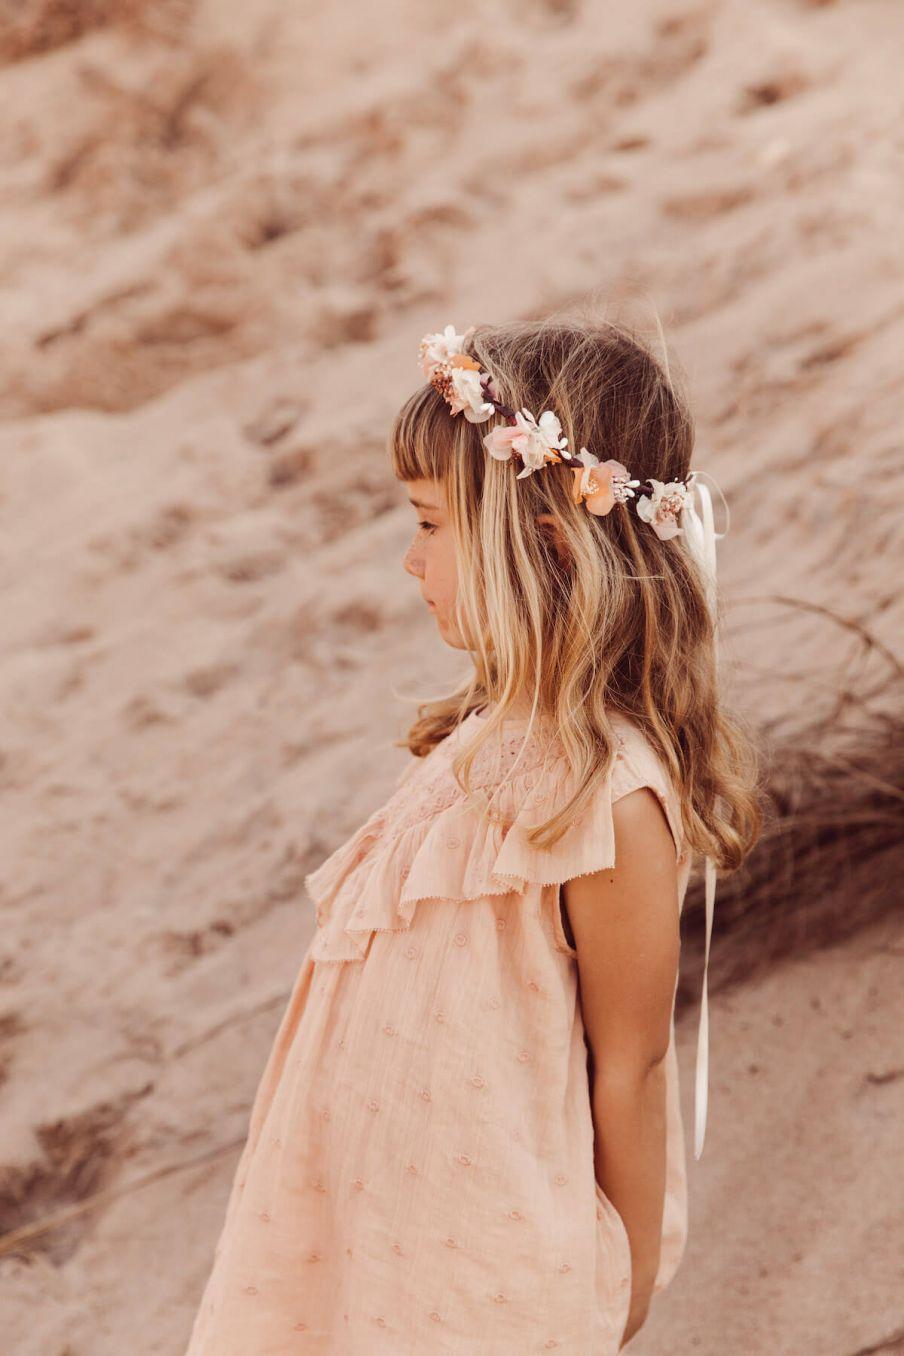 boheme chic vintage robe bébé fille noalia sienna plumetis